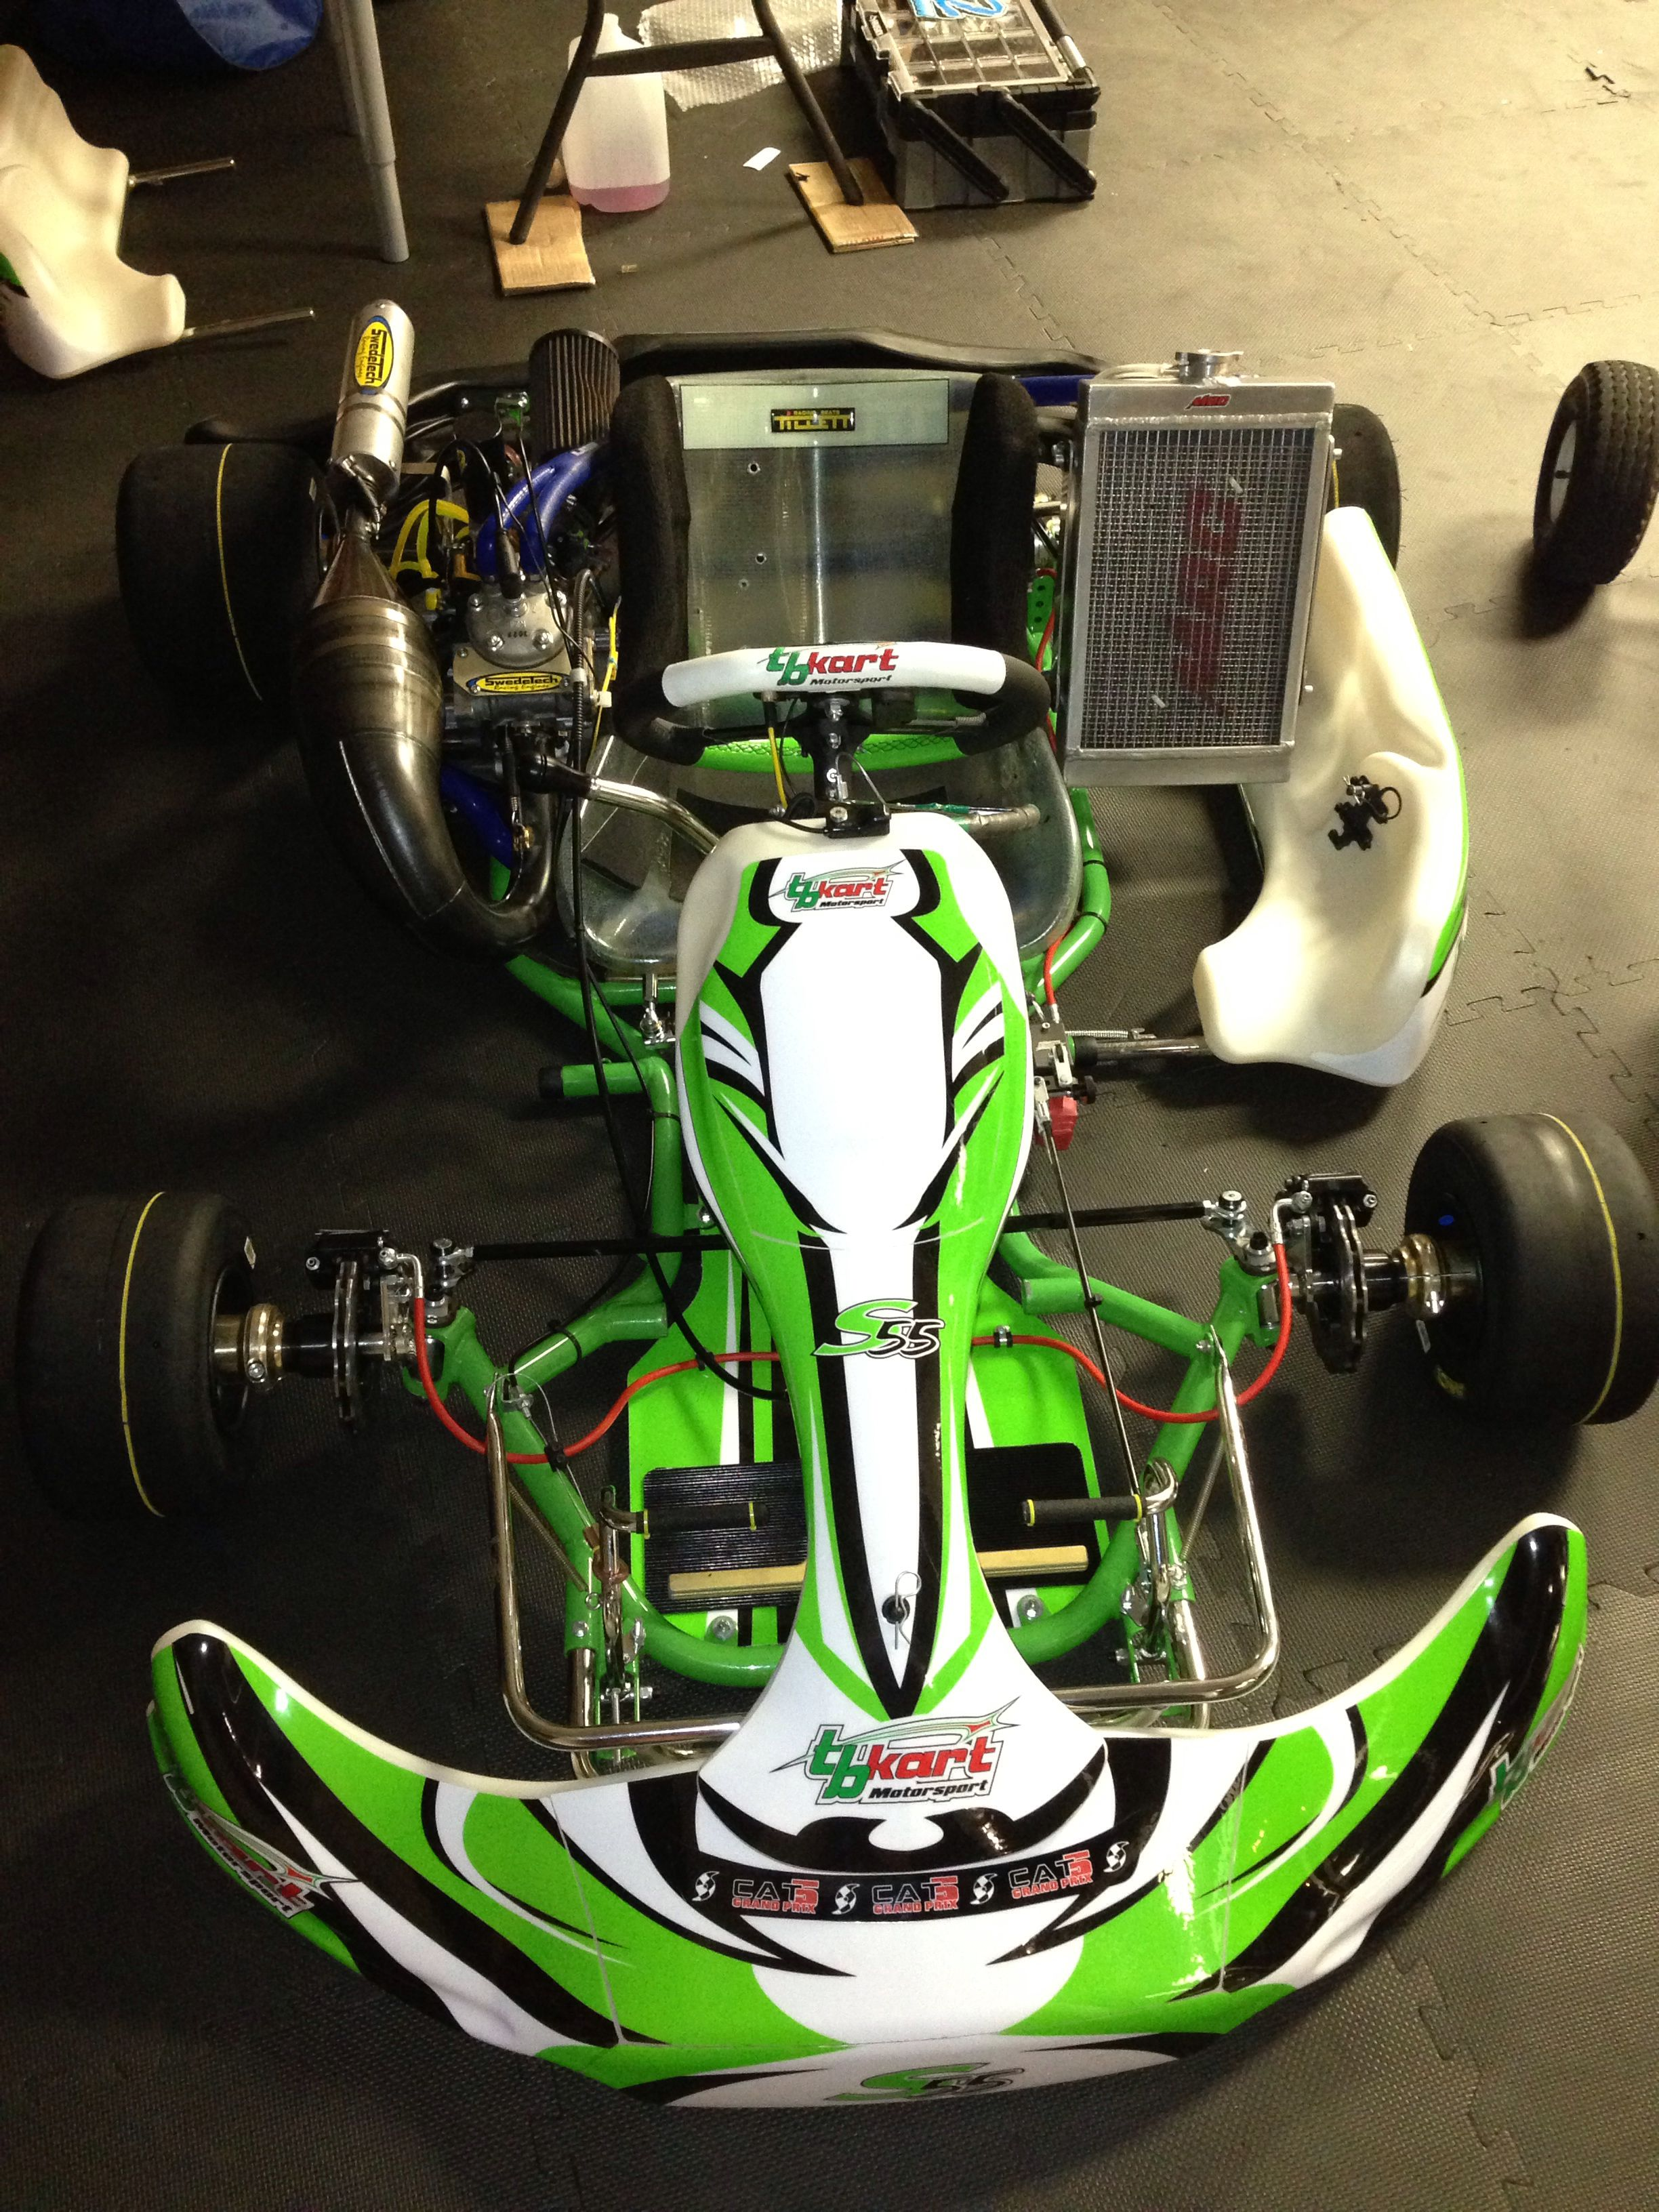 TB Kart. 125 Stock Moto Shifter Kart. Driven to win! | Go Karts ...